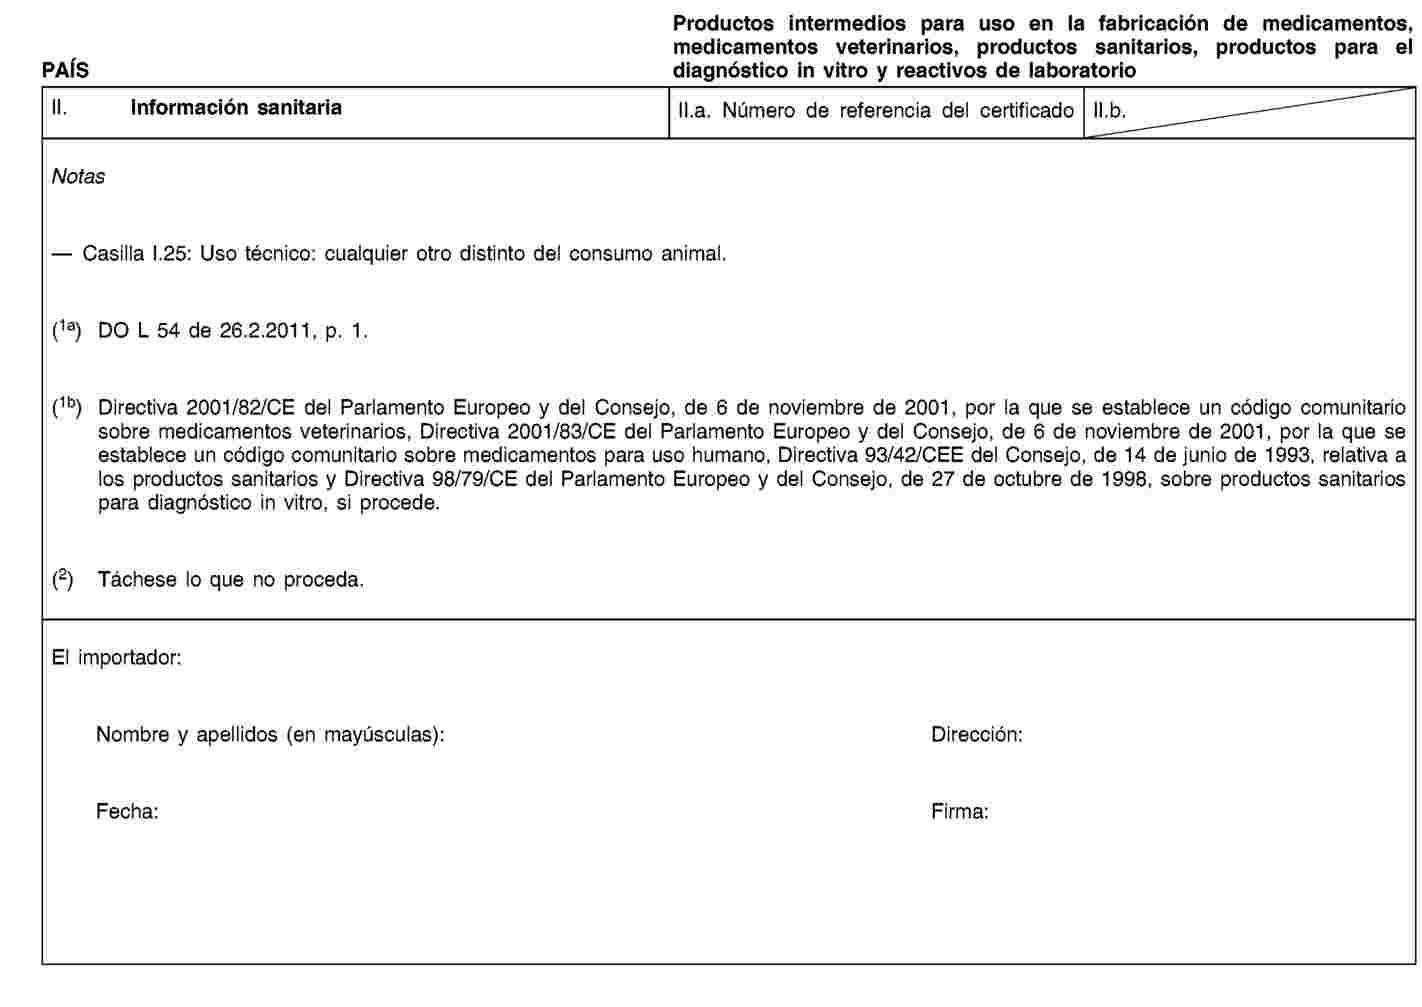 Imagen: https://eur-lex.europa.eu/resource.html?uri=uriserv:OJ.L_.2011.054.01.0001.01.SPA.xhtml.L_2011054ES.01024801.tif.jpg